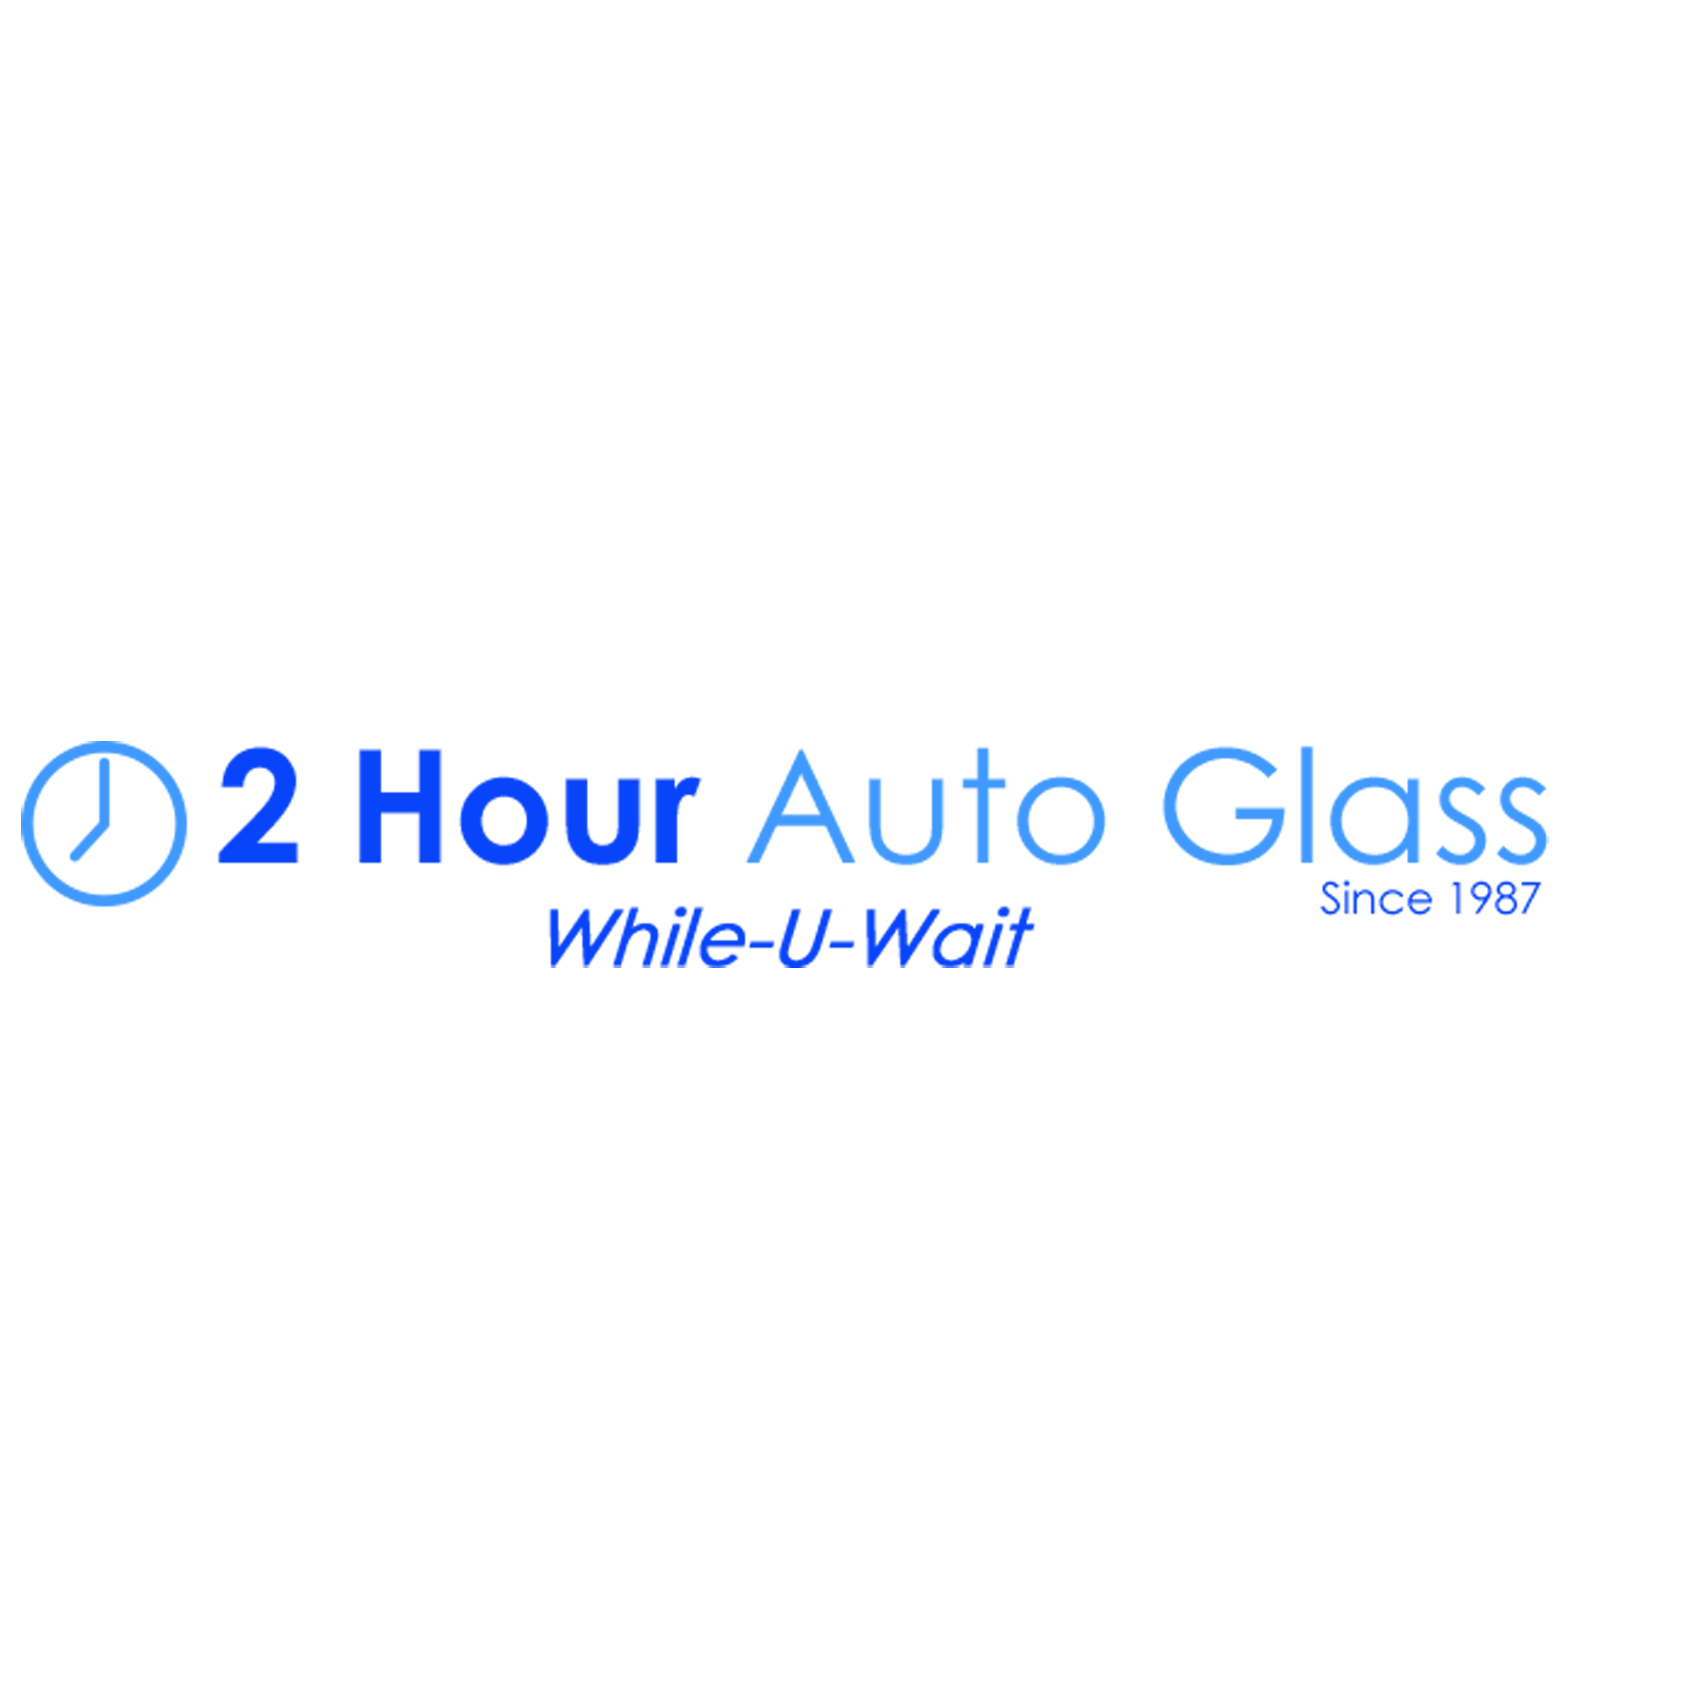 2 Hour Auto Glass - Brooklyn, NY - Auto Glass & Windshield Repair